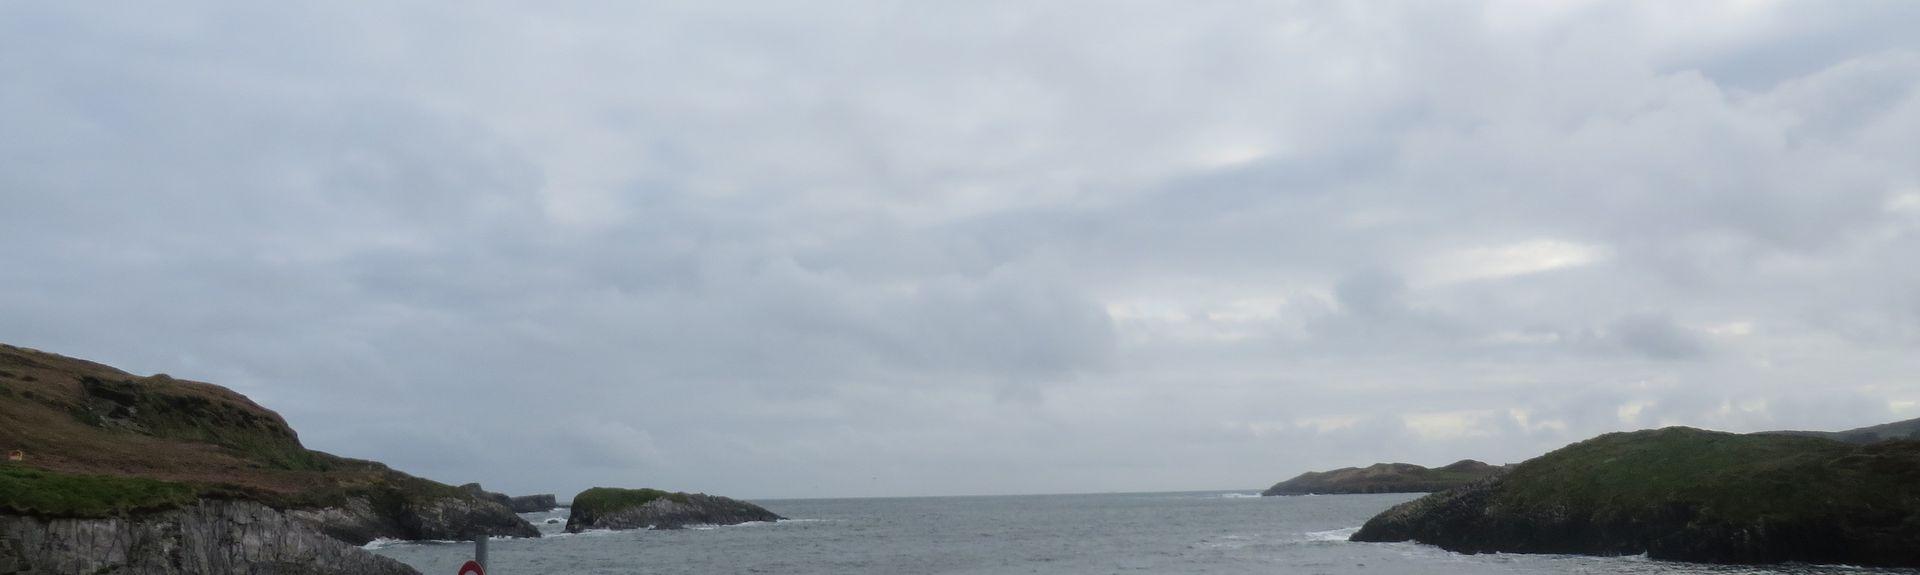 Spiaggia di Owenahincha, Irlanda